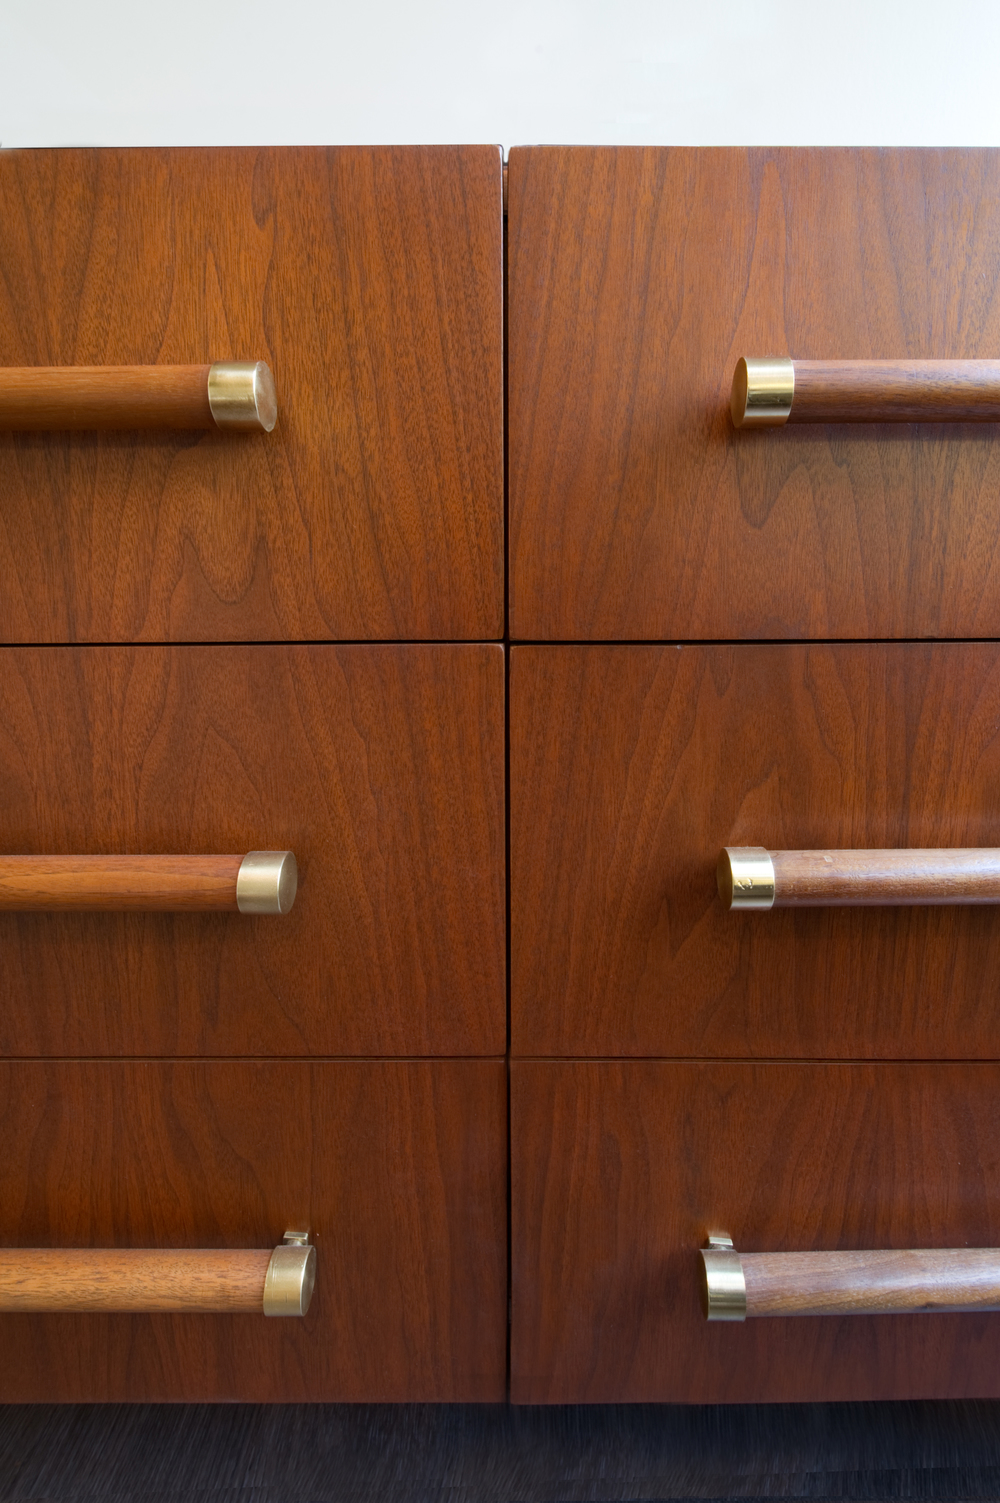 Charmed_Mag_27 - Cabinet Detail.jpg